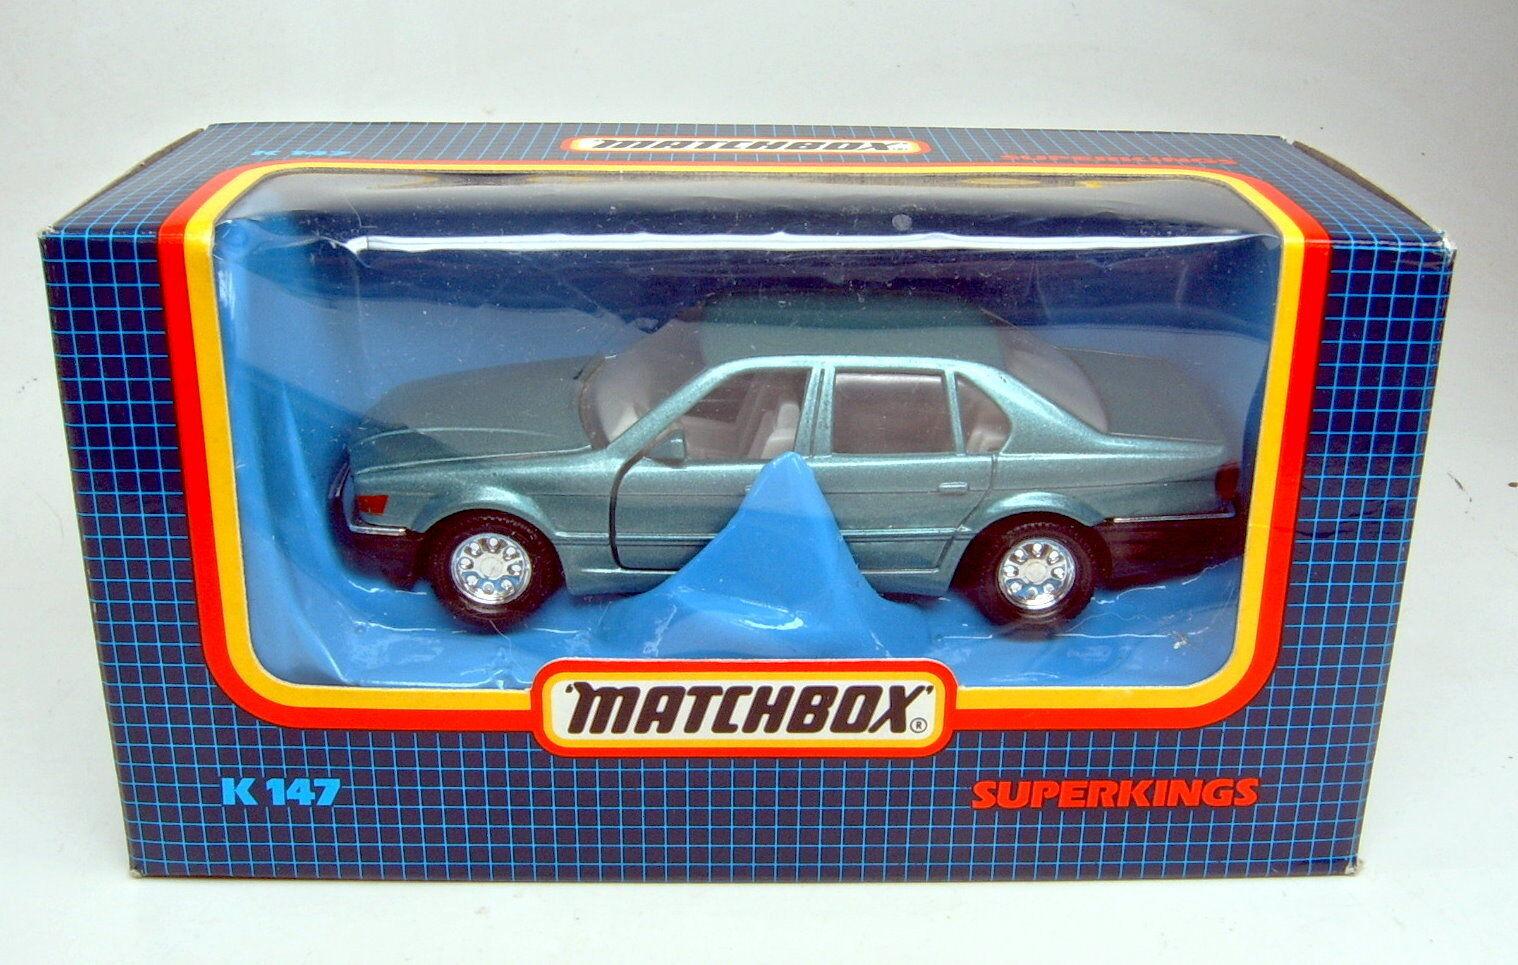 MATCHBOX SUPERKING k-147 BMW 750 il bleumetallic Top Dans Box